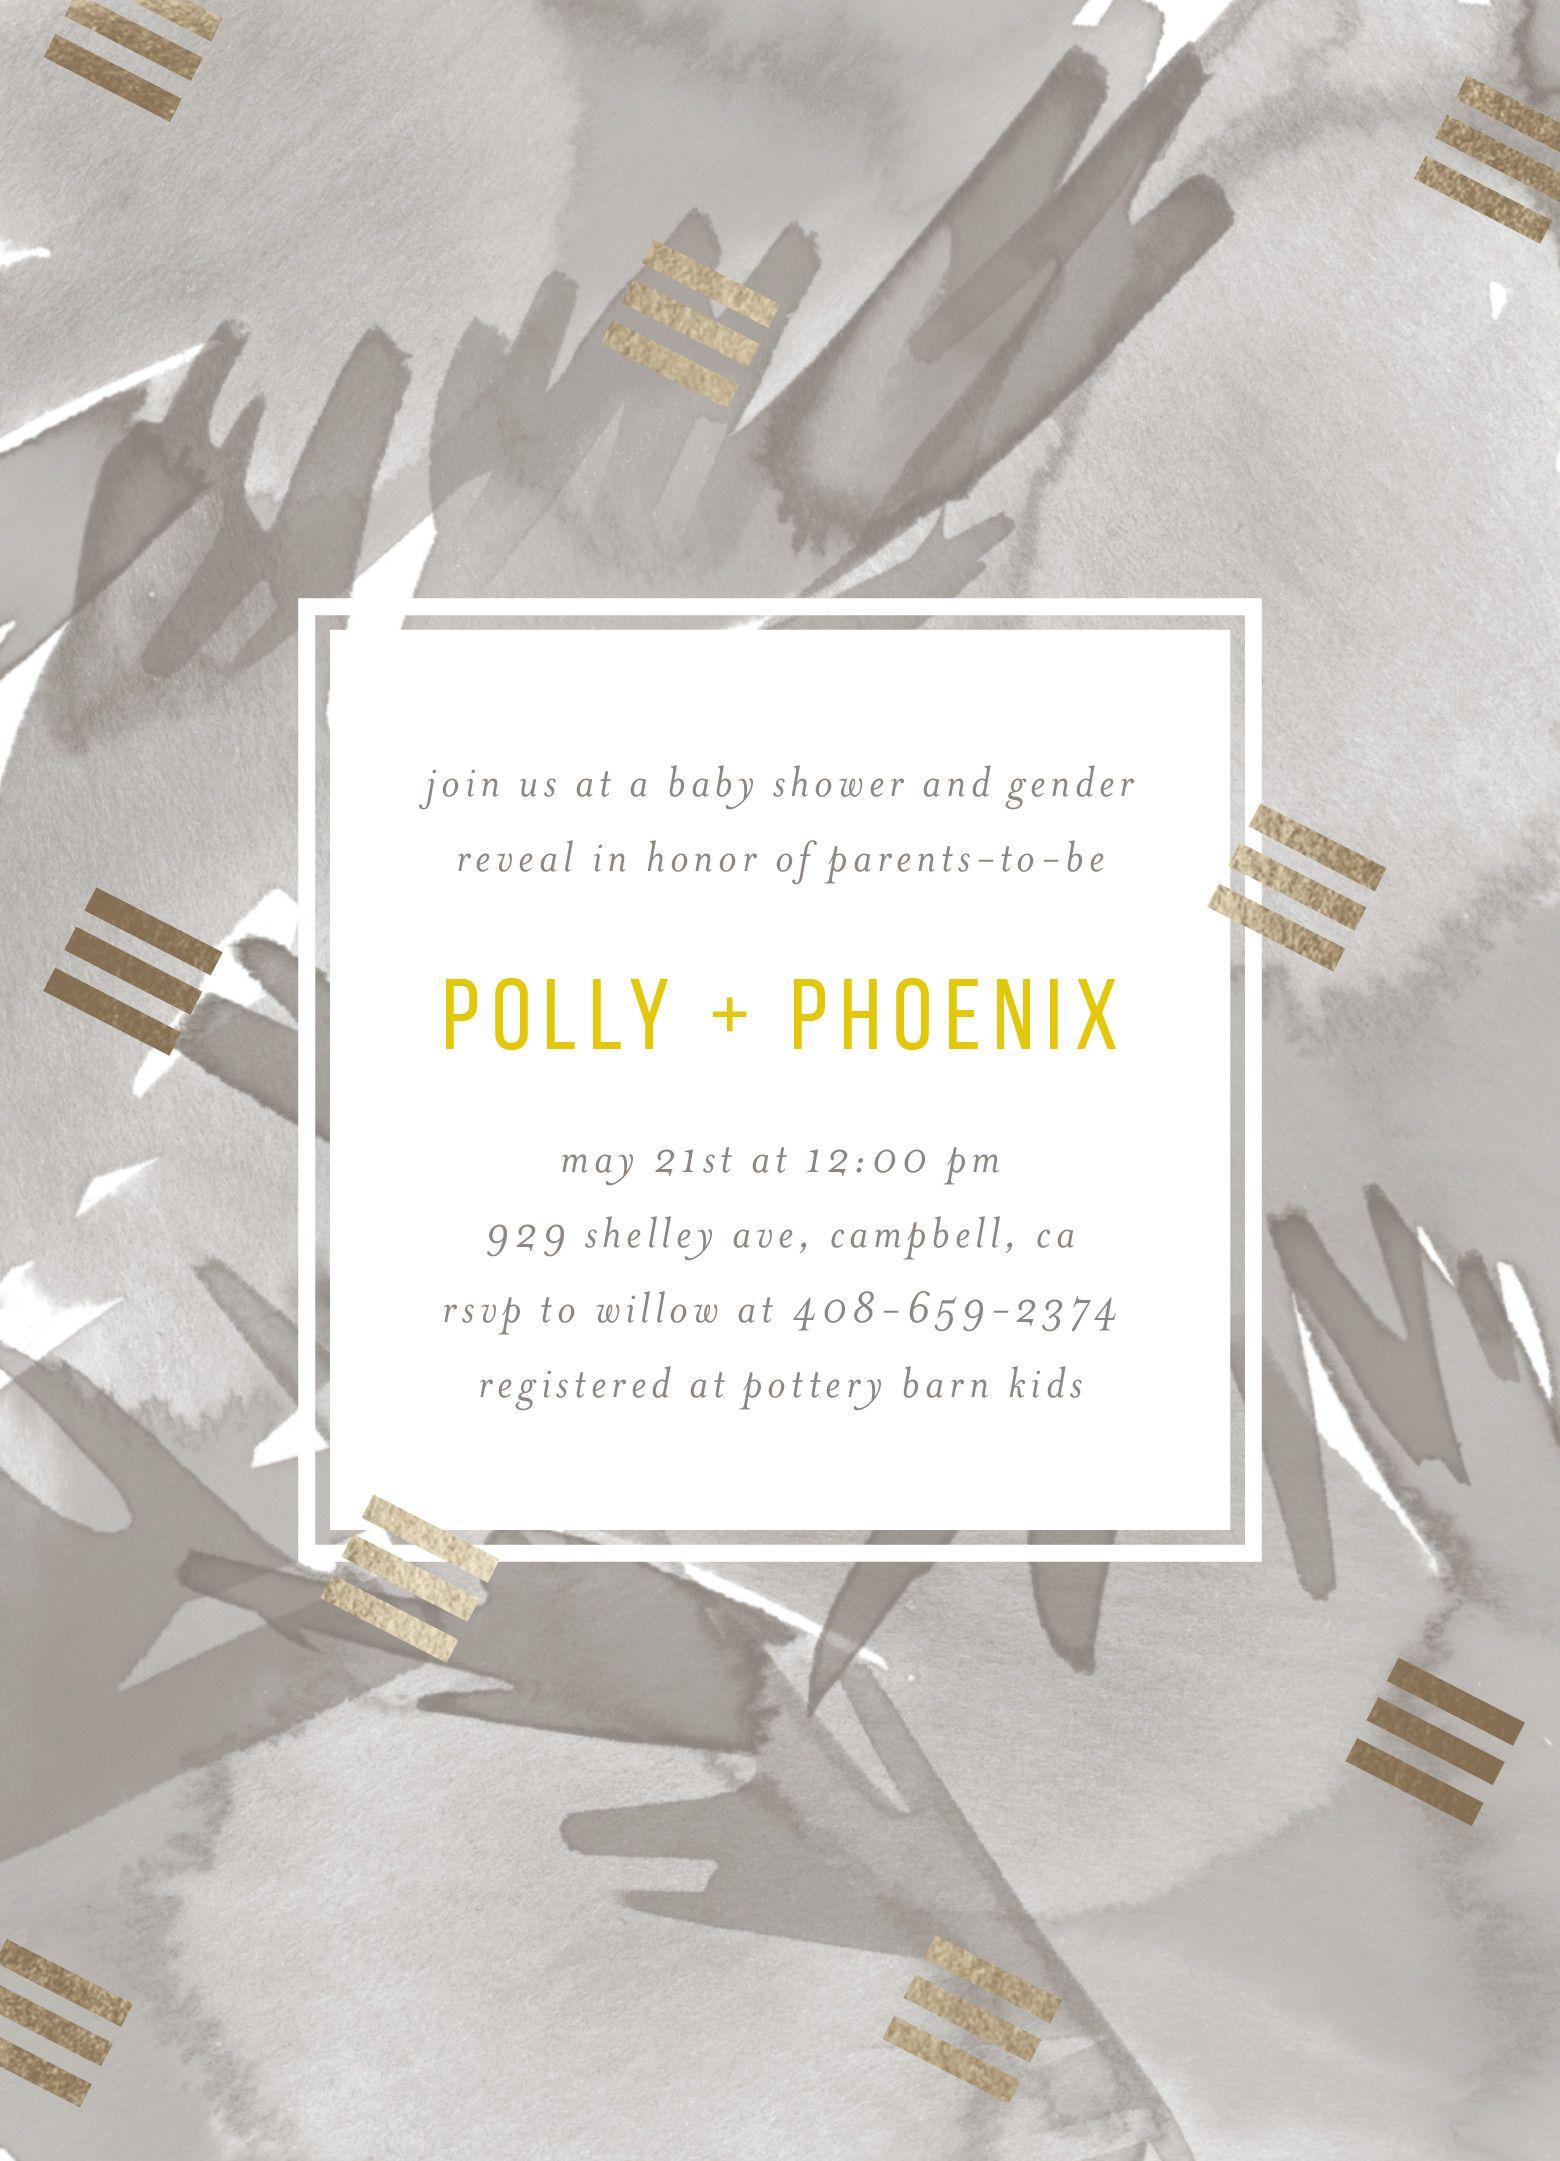 Bohemian gray watercolor and gold foil baby shower invite design